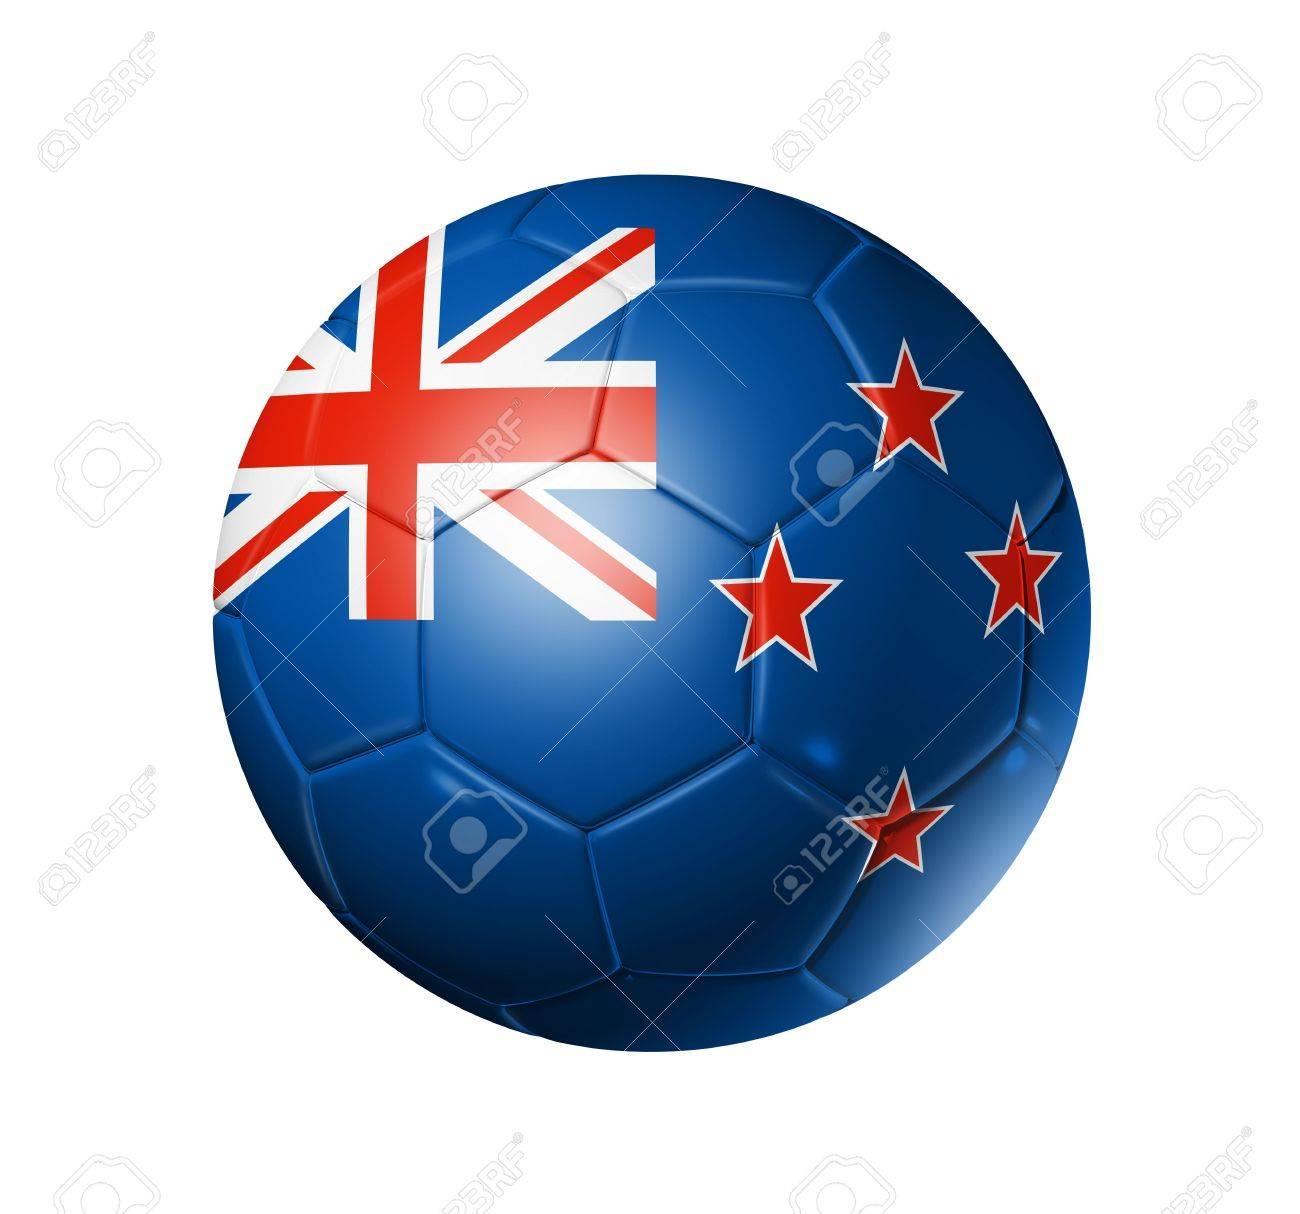 3d Fußball Ball Mit Neuseeland Team Flag Fußball Wm 2010